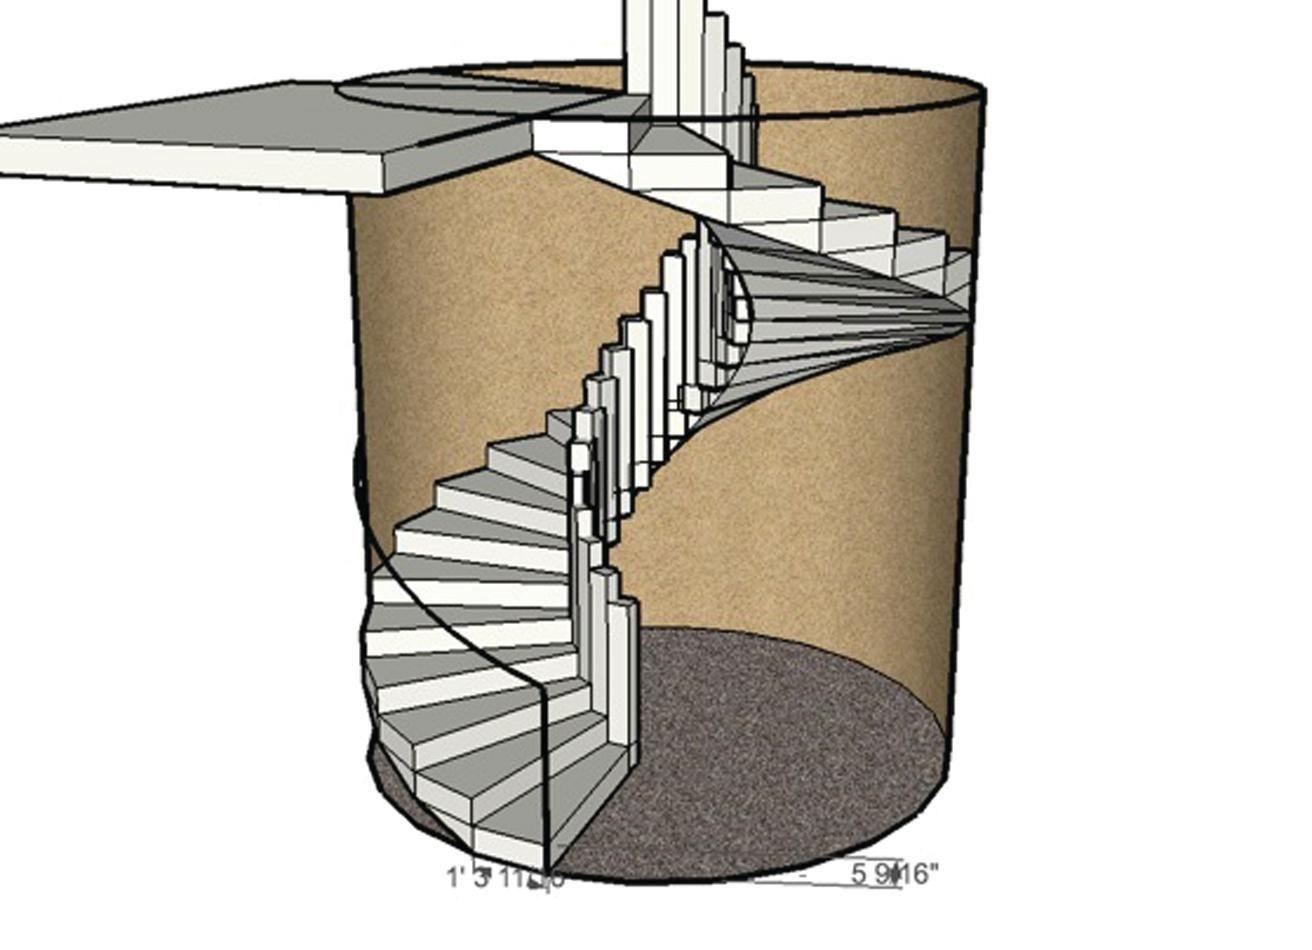 Forming A Circular Concrete Staircase Concrete Construction Magazine | Semi Spiral Staircase Design | Curved Staircase | Residential Library | Interior | Futuristic | Iron